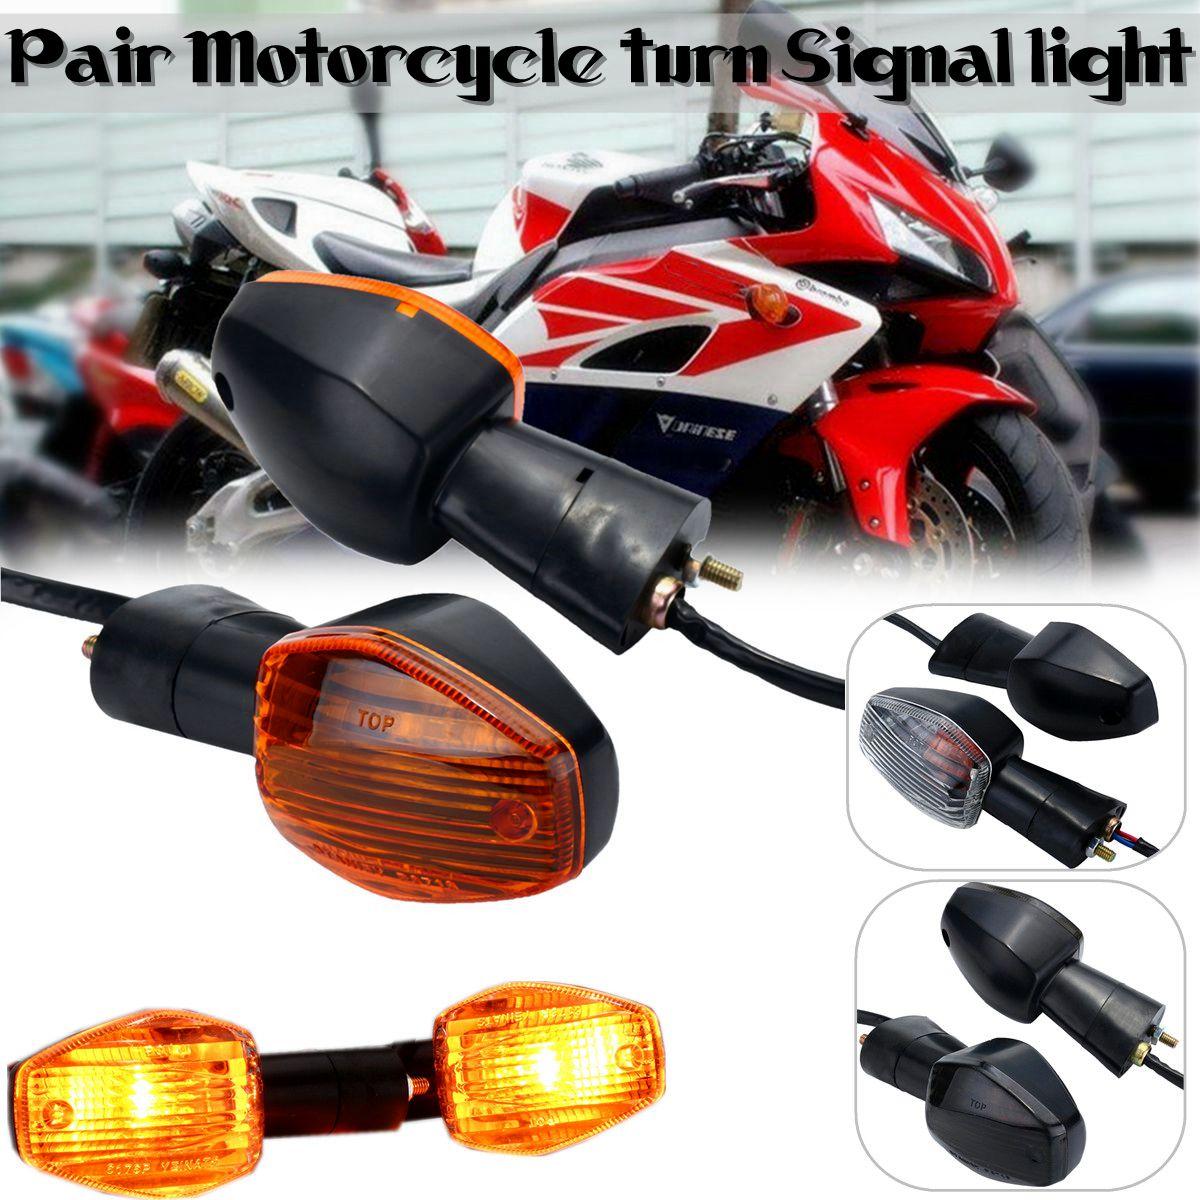 1 Pair Turn Signal Light Indicator For Honda CB400 CB1300 CBR 600 1000 RR F4 F4i Motorcycle Accessories Indicator Lamp Flashing